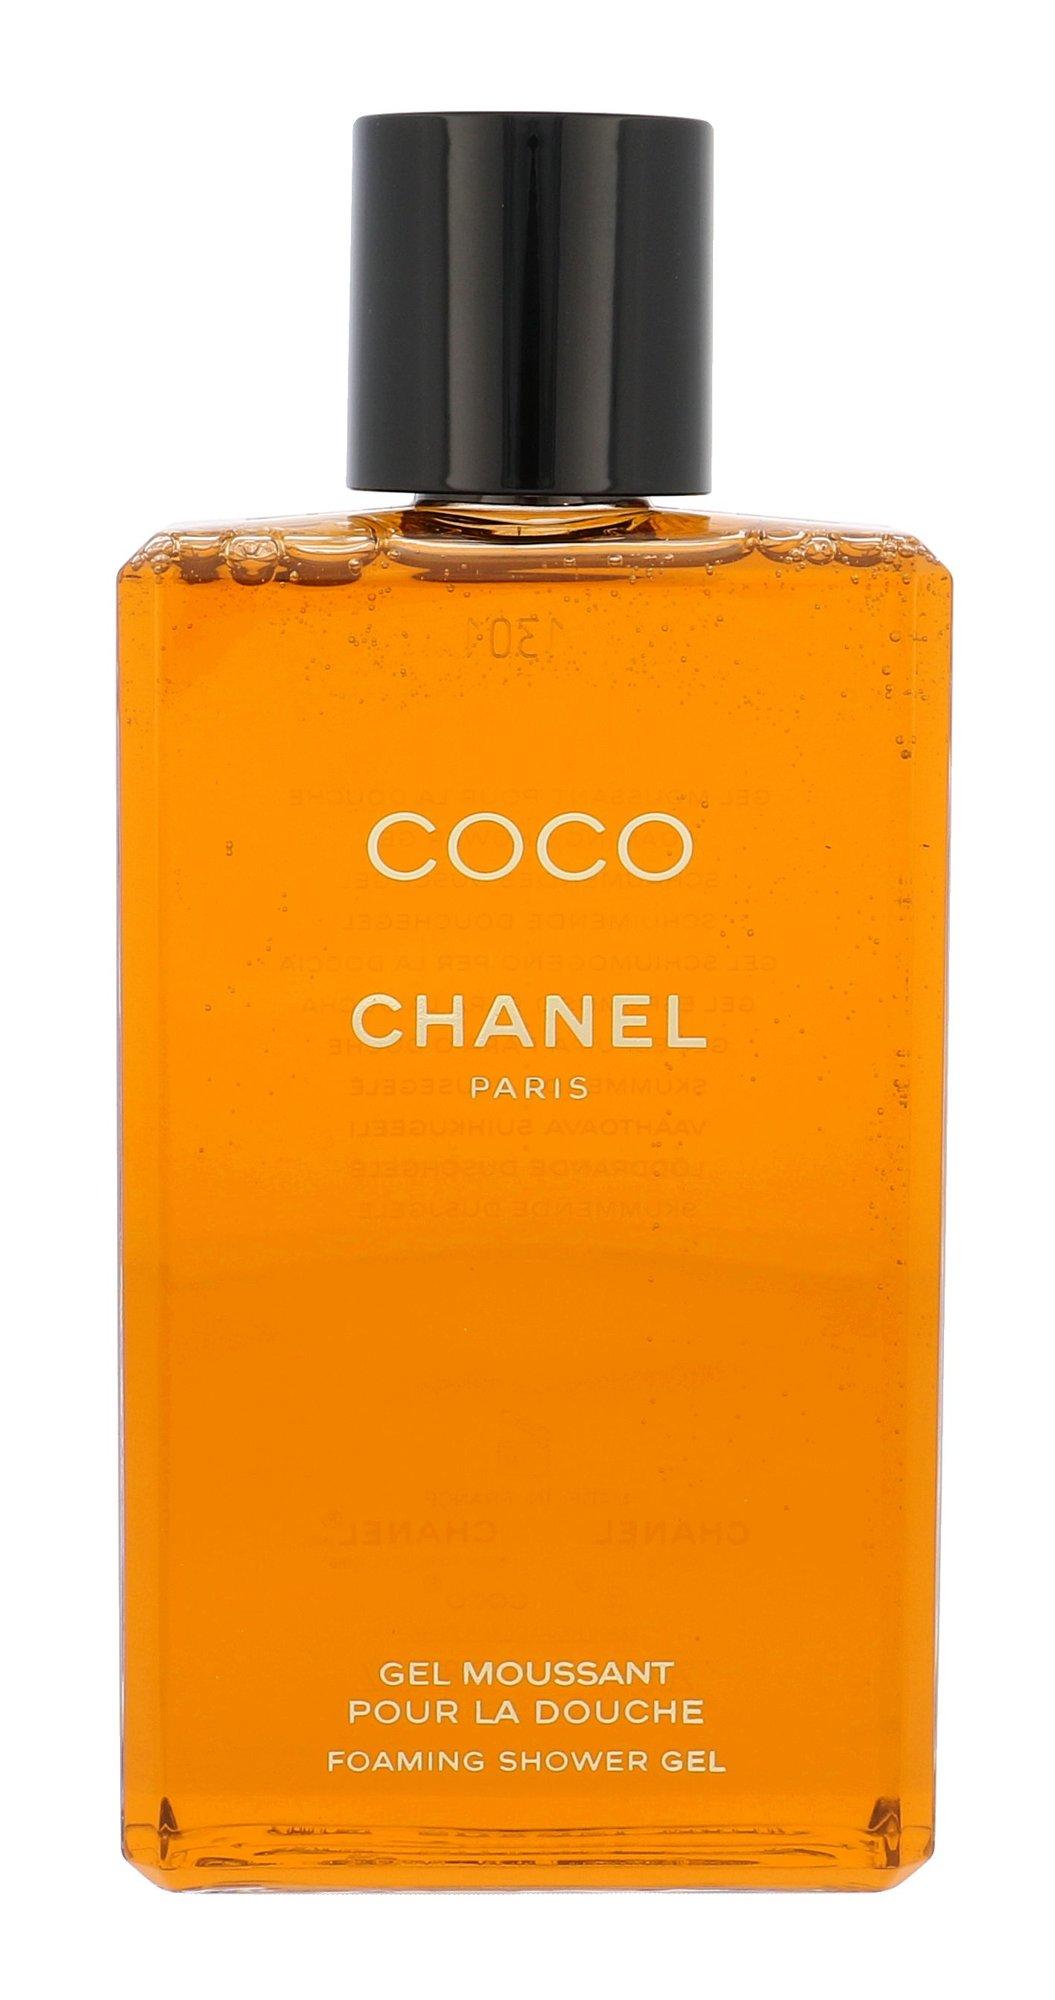 Chanel Coco Shower gel 200ml